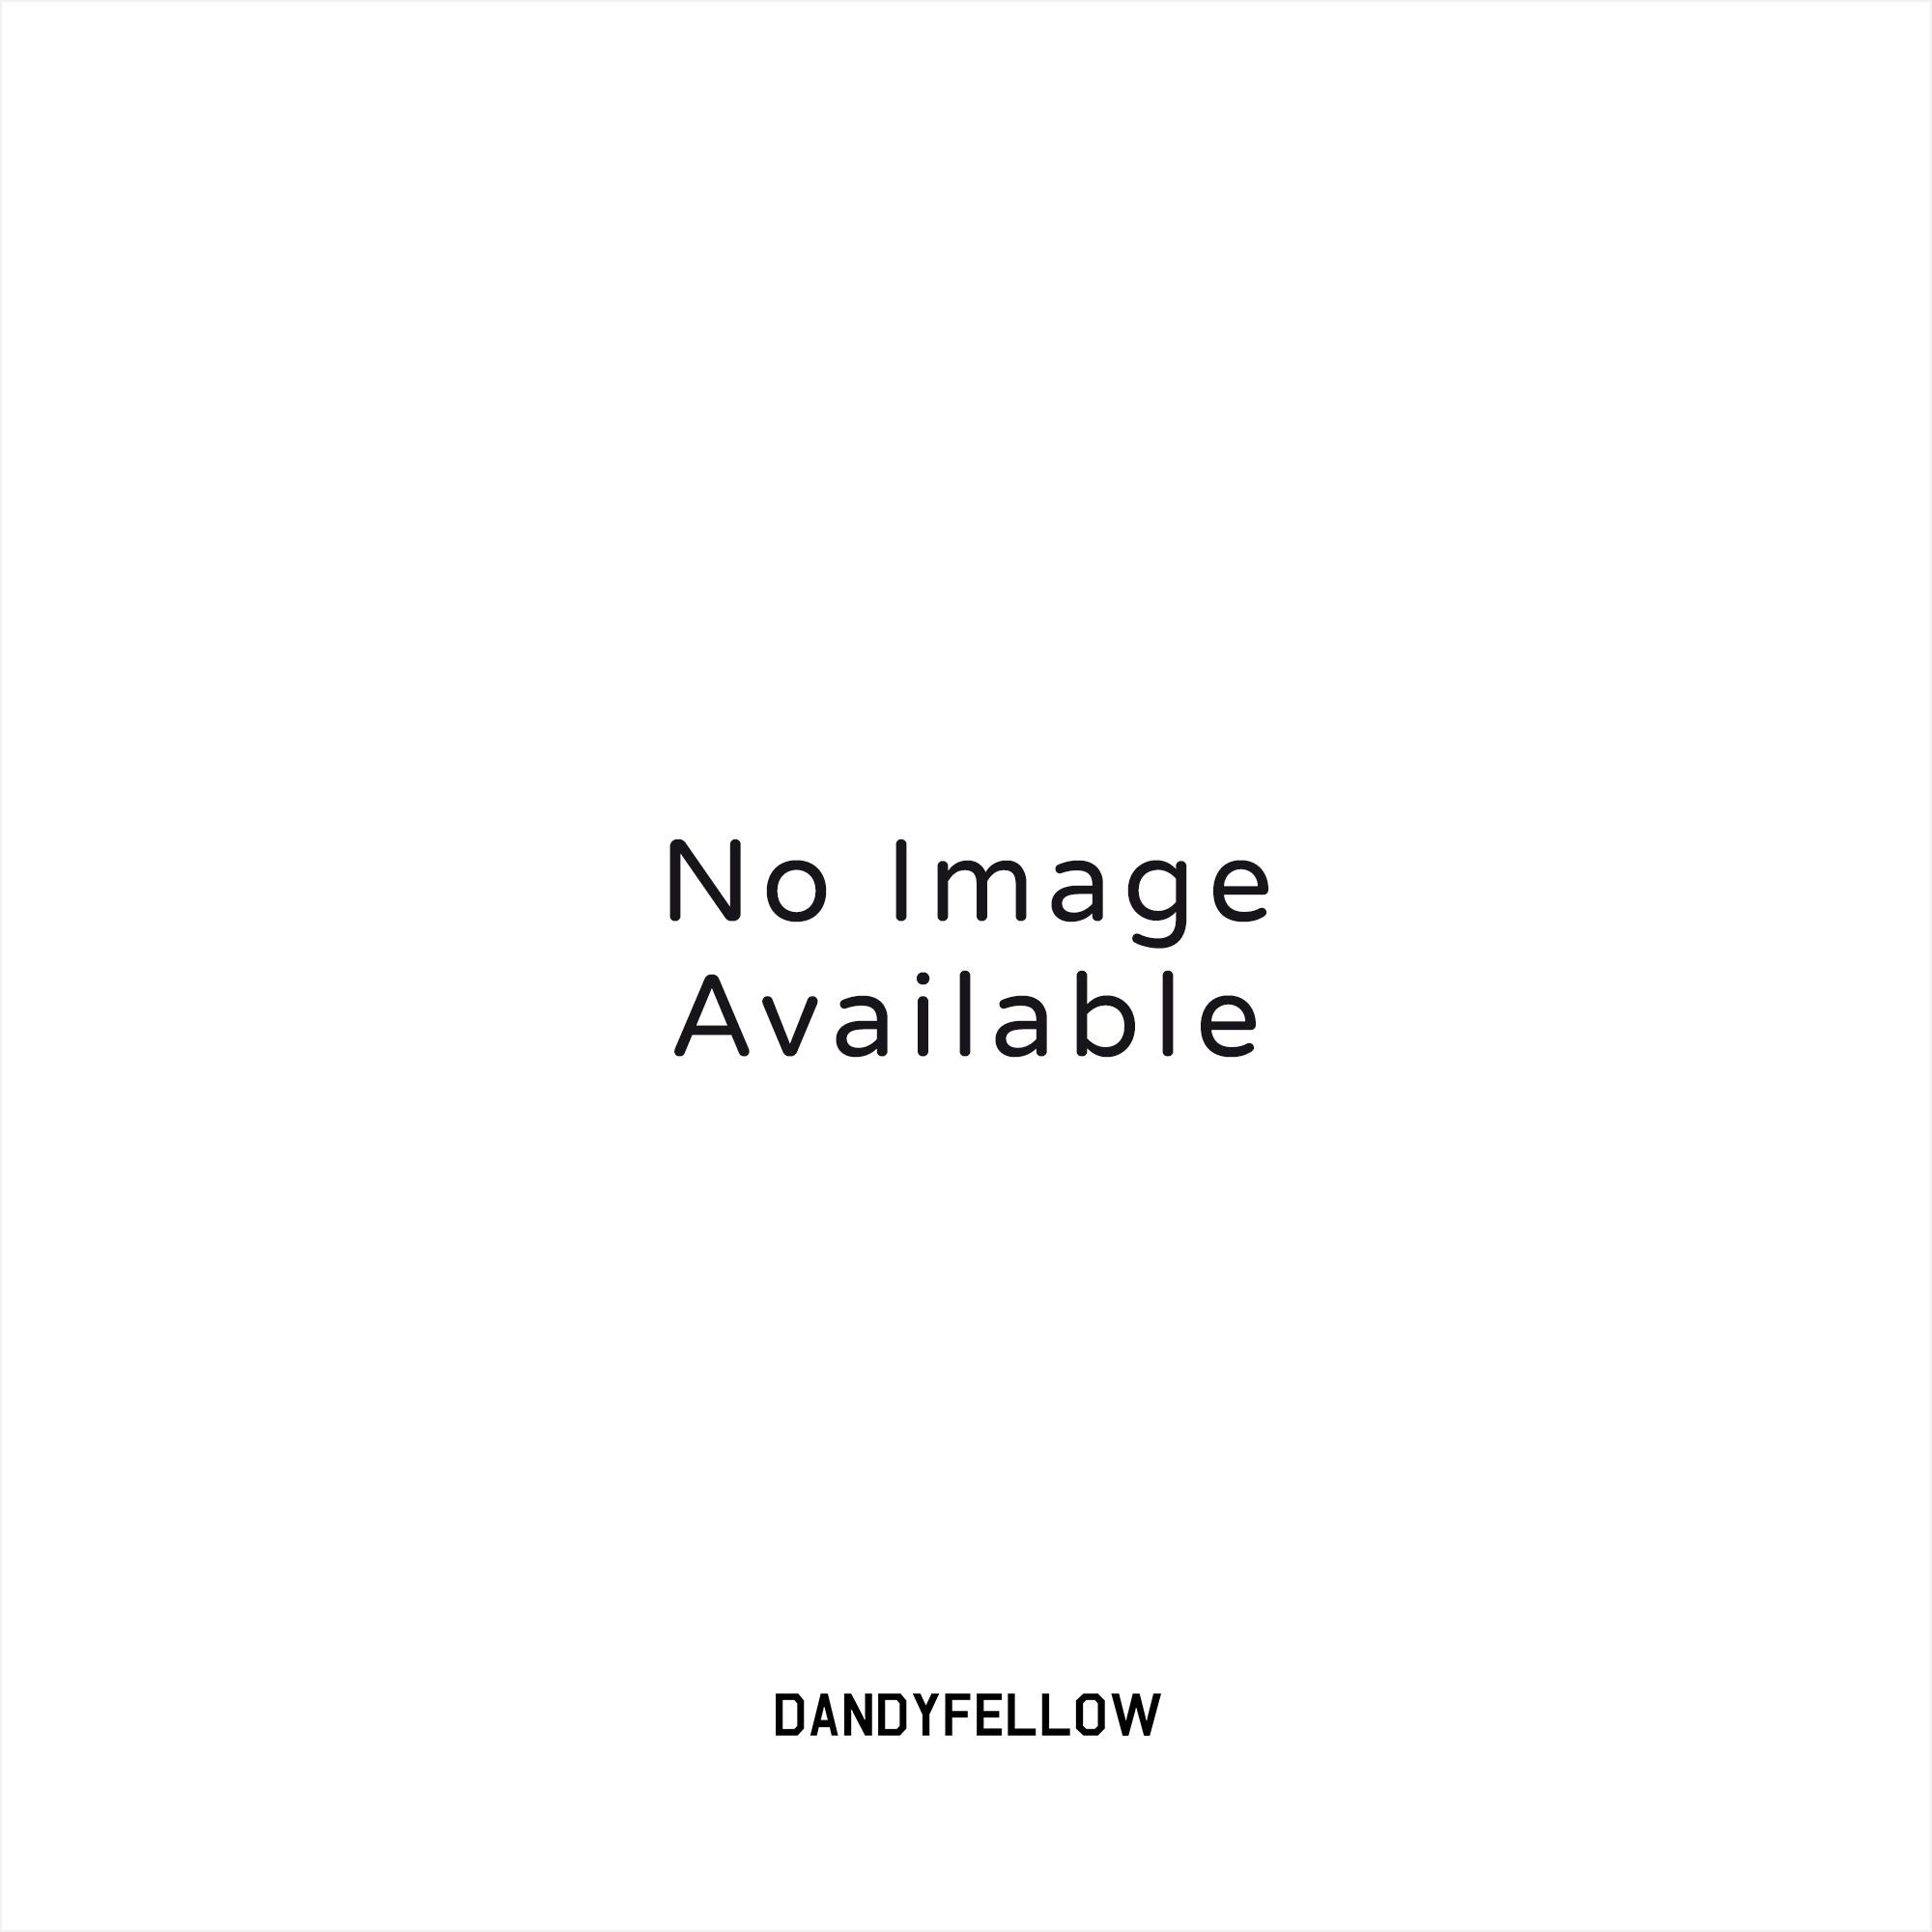 Barbour Moons Tweed Olive Herringbone Flat Cap MHA0295OL55 b73e4c08237